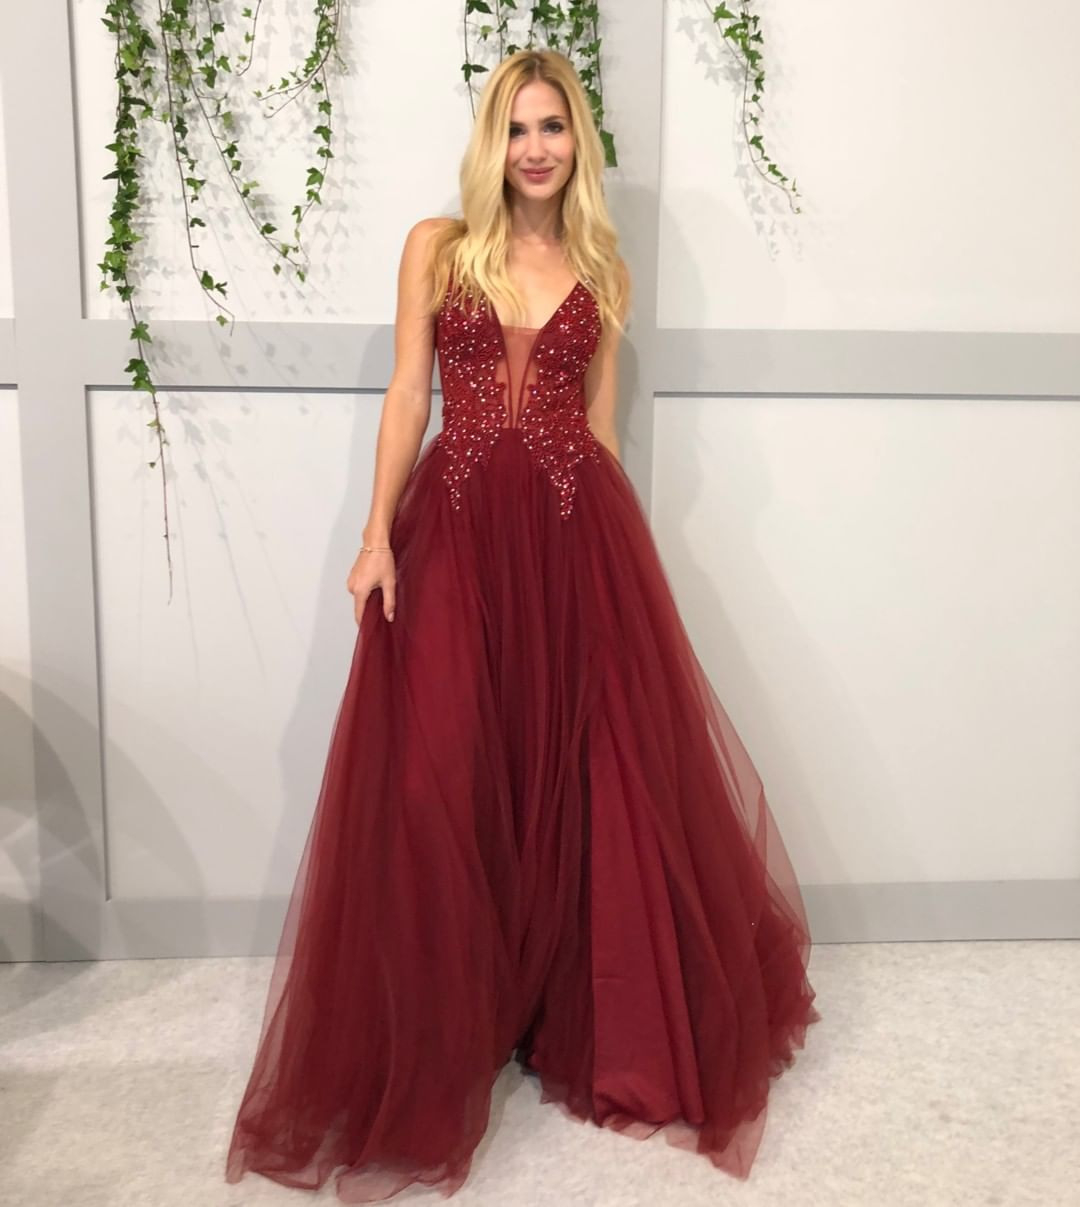 Genial Abend Kleid Lang Rot StylishFormal Perfekt Abend Kleid Lang Rot Ärmel